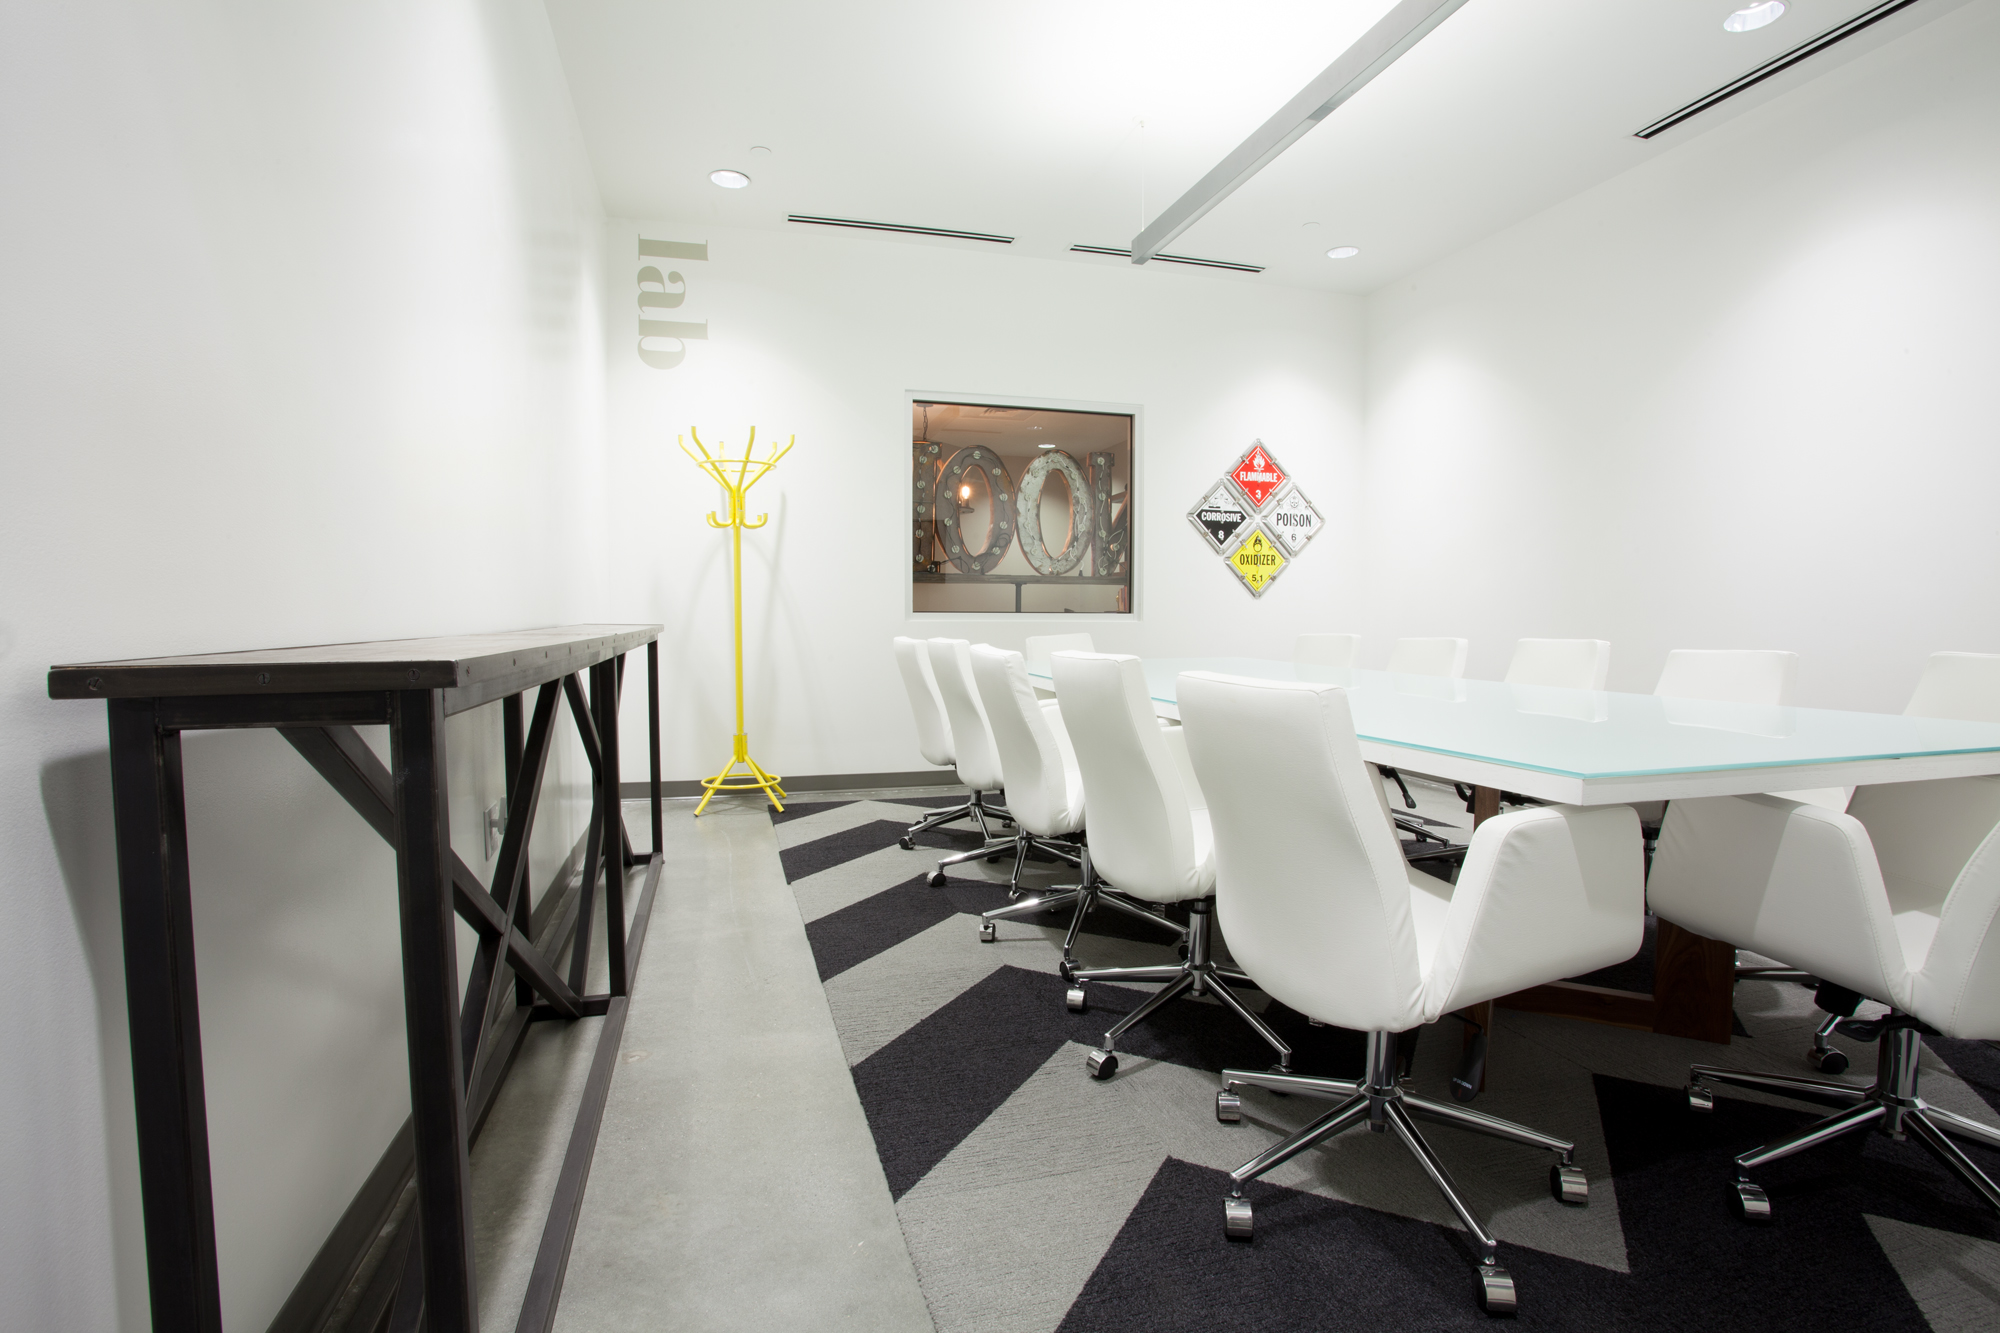 ROAM coworking conference room design.jpg